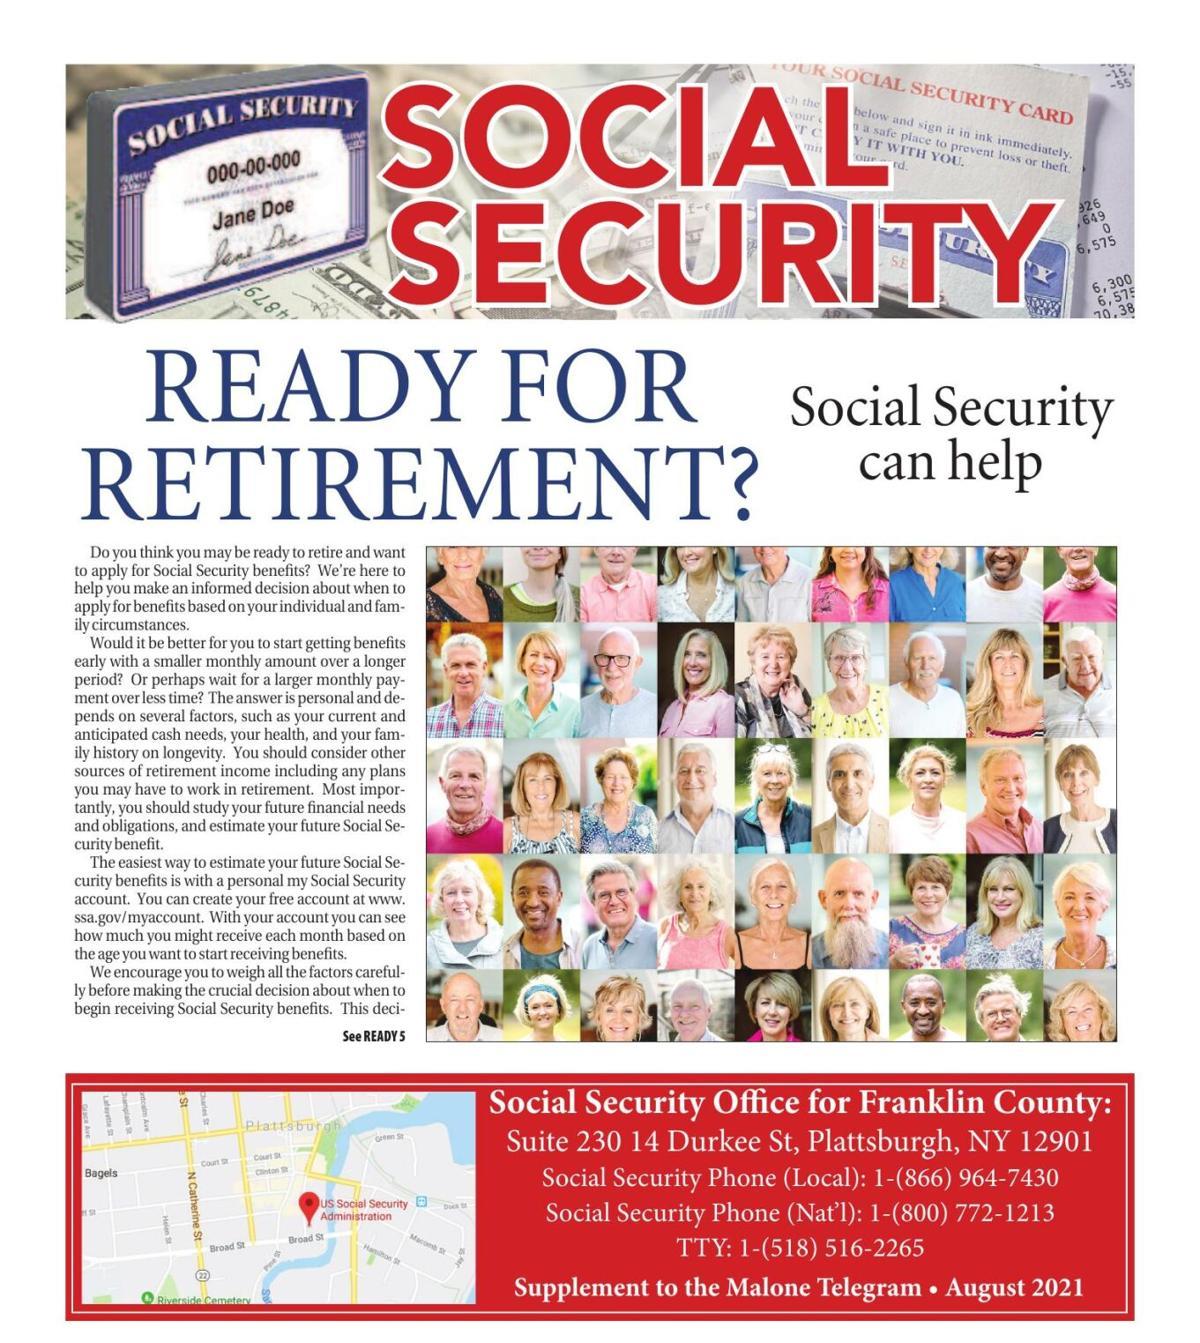 Social Security Edition